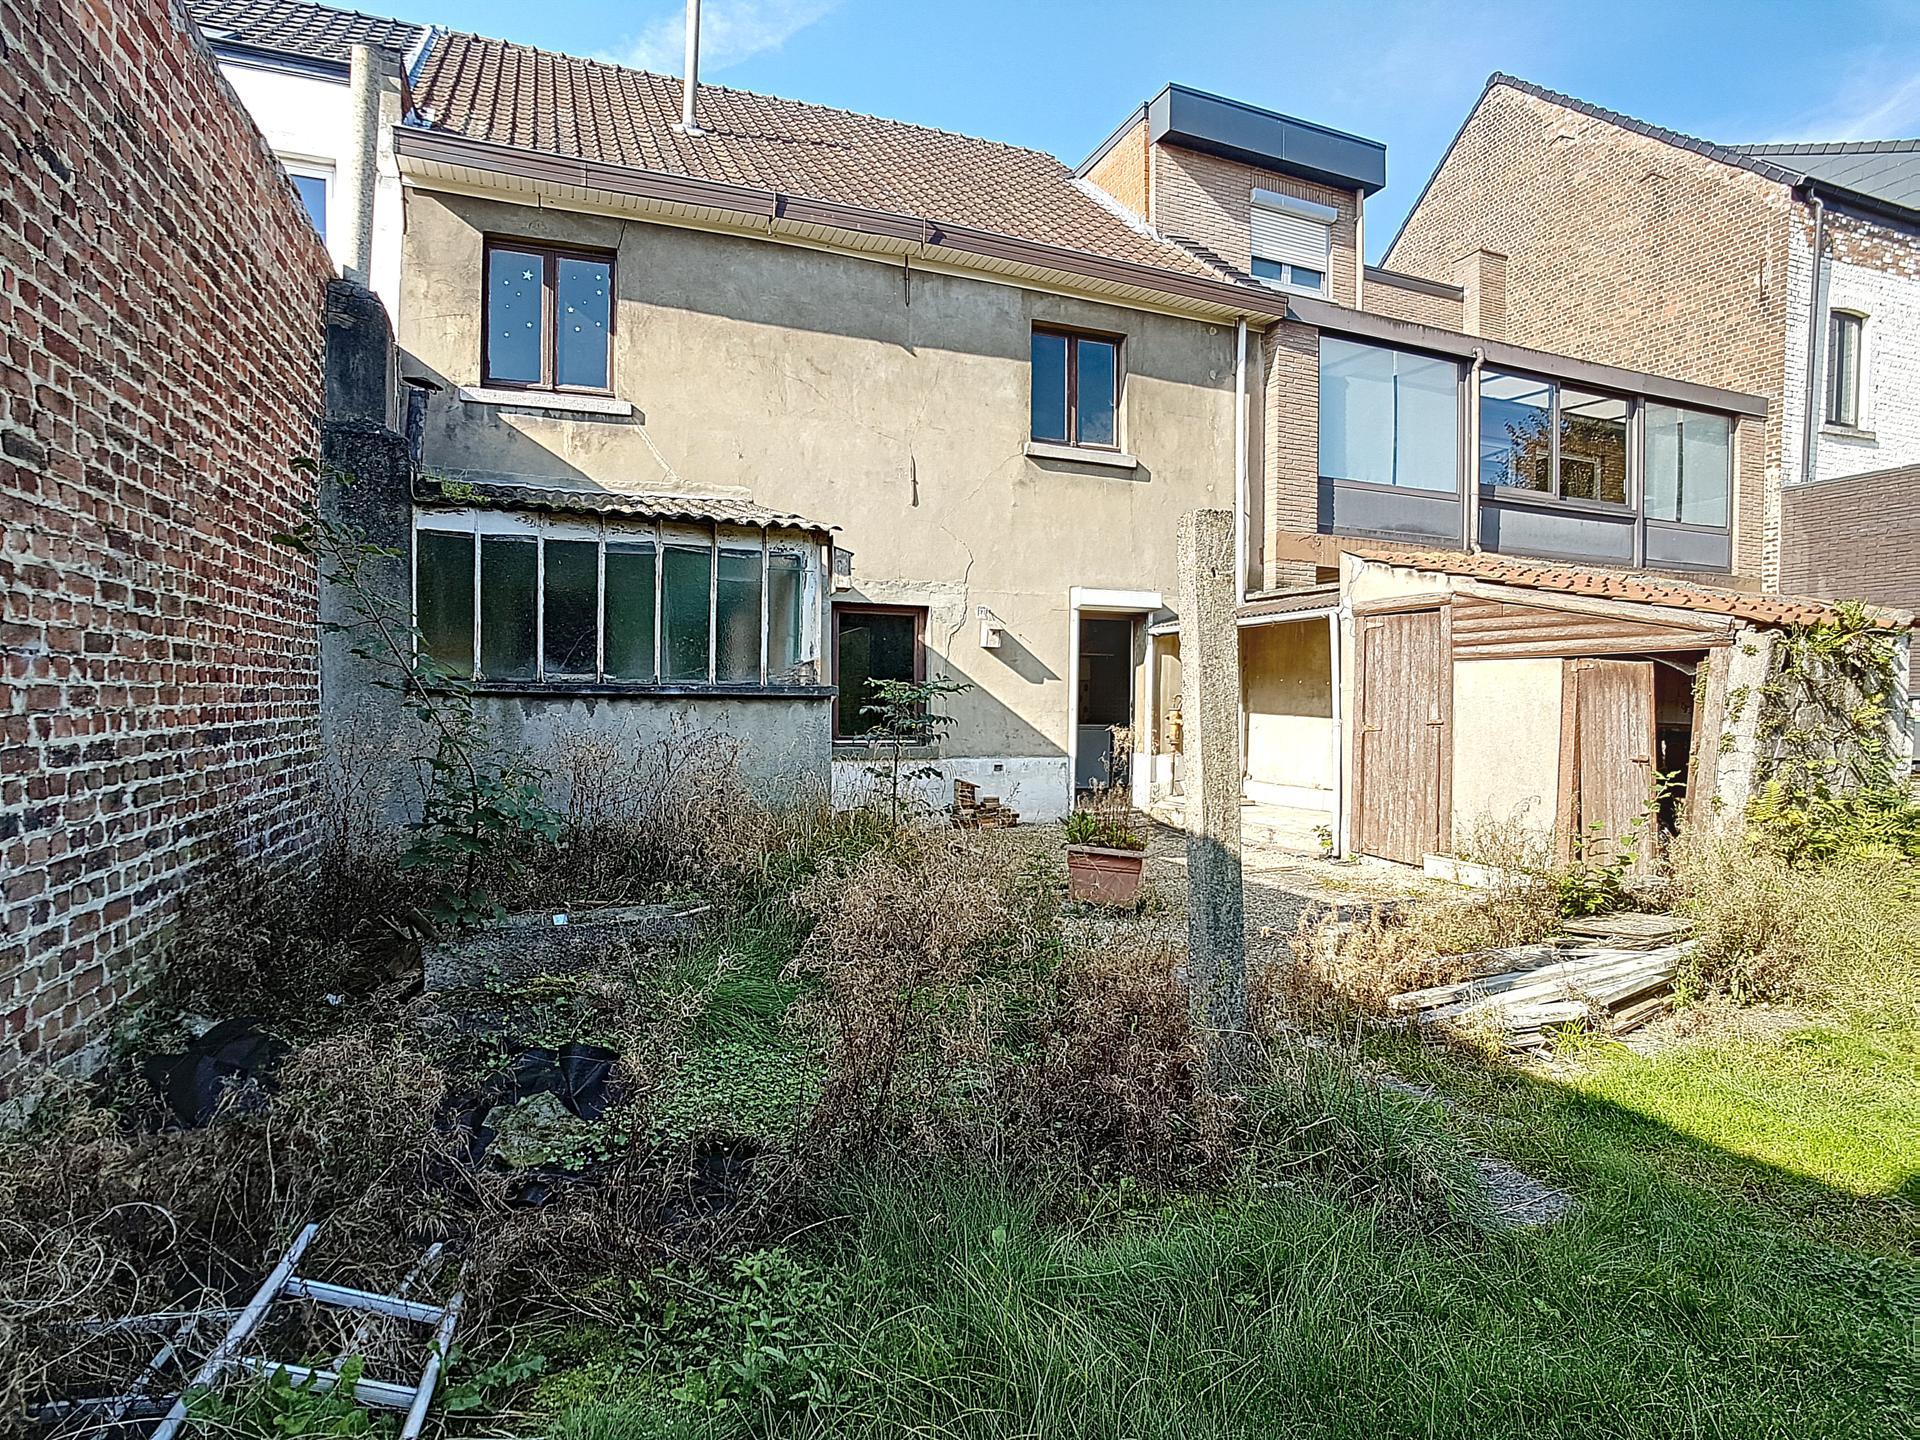 Maison - Zaventem Sterrebeek - #4507431-24